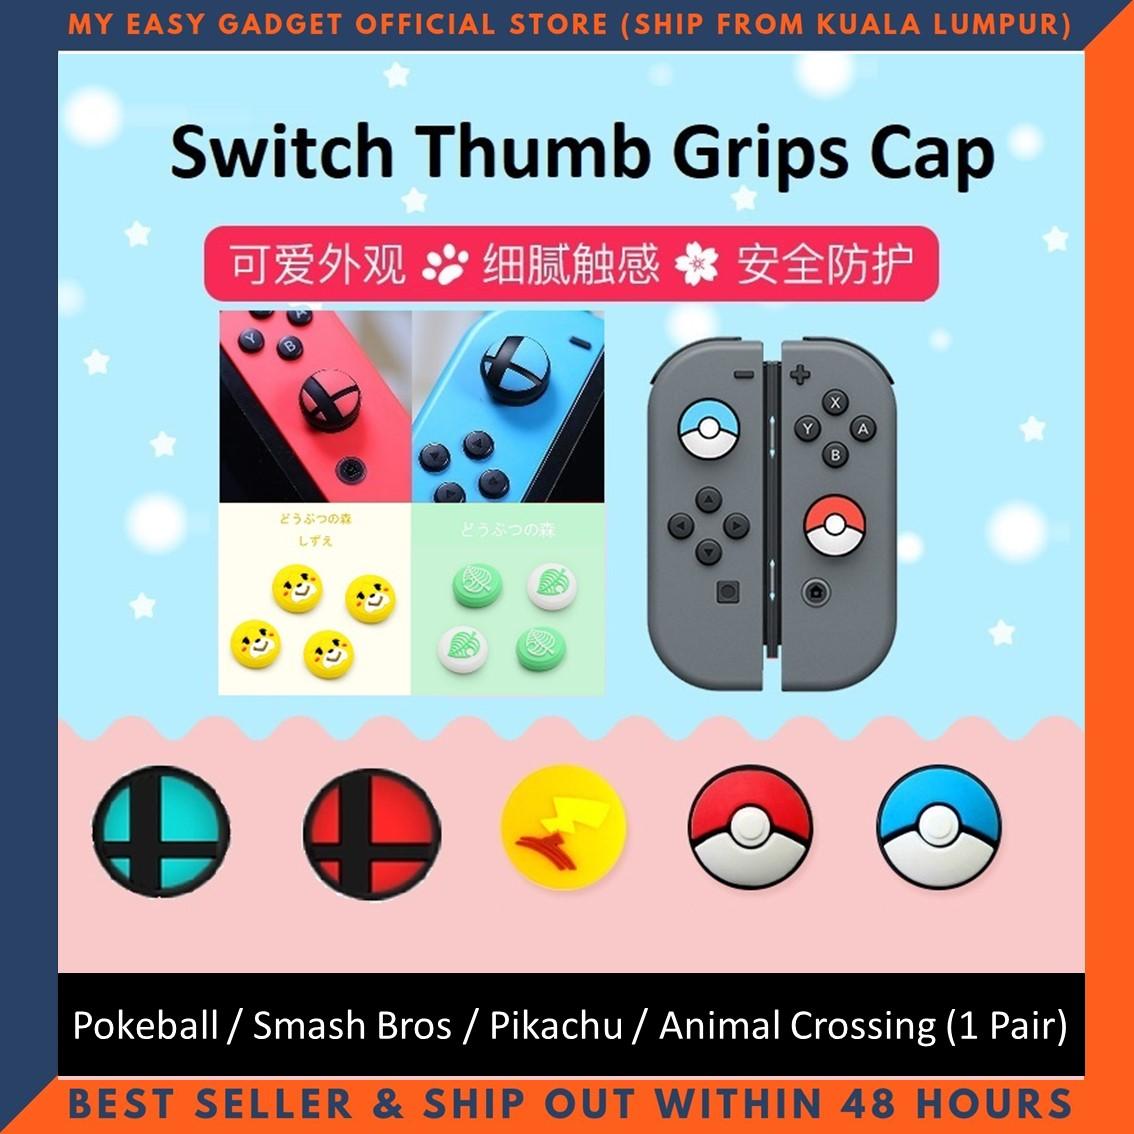 Silicone Analog Pokeball / Smash Bros / Pikachu / Animal Crossing Theme Thumb Grips Cap for Nintendo Switch